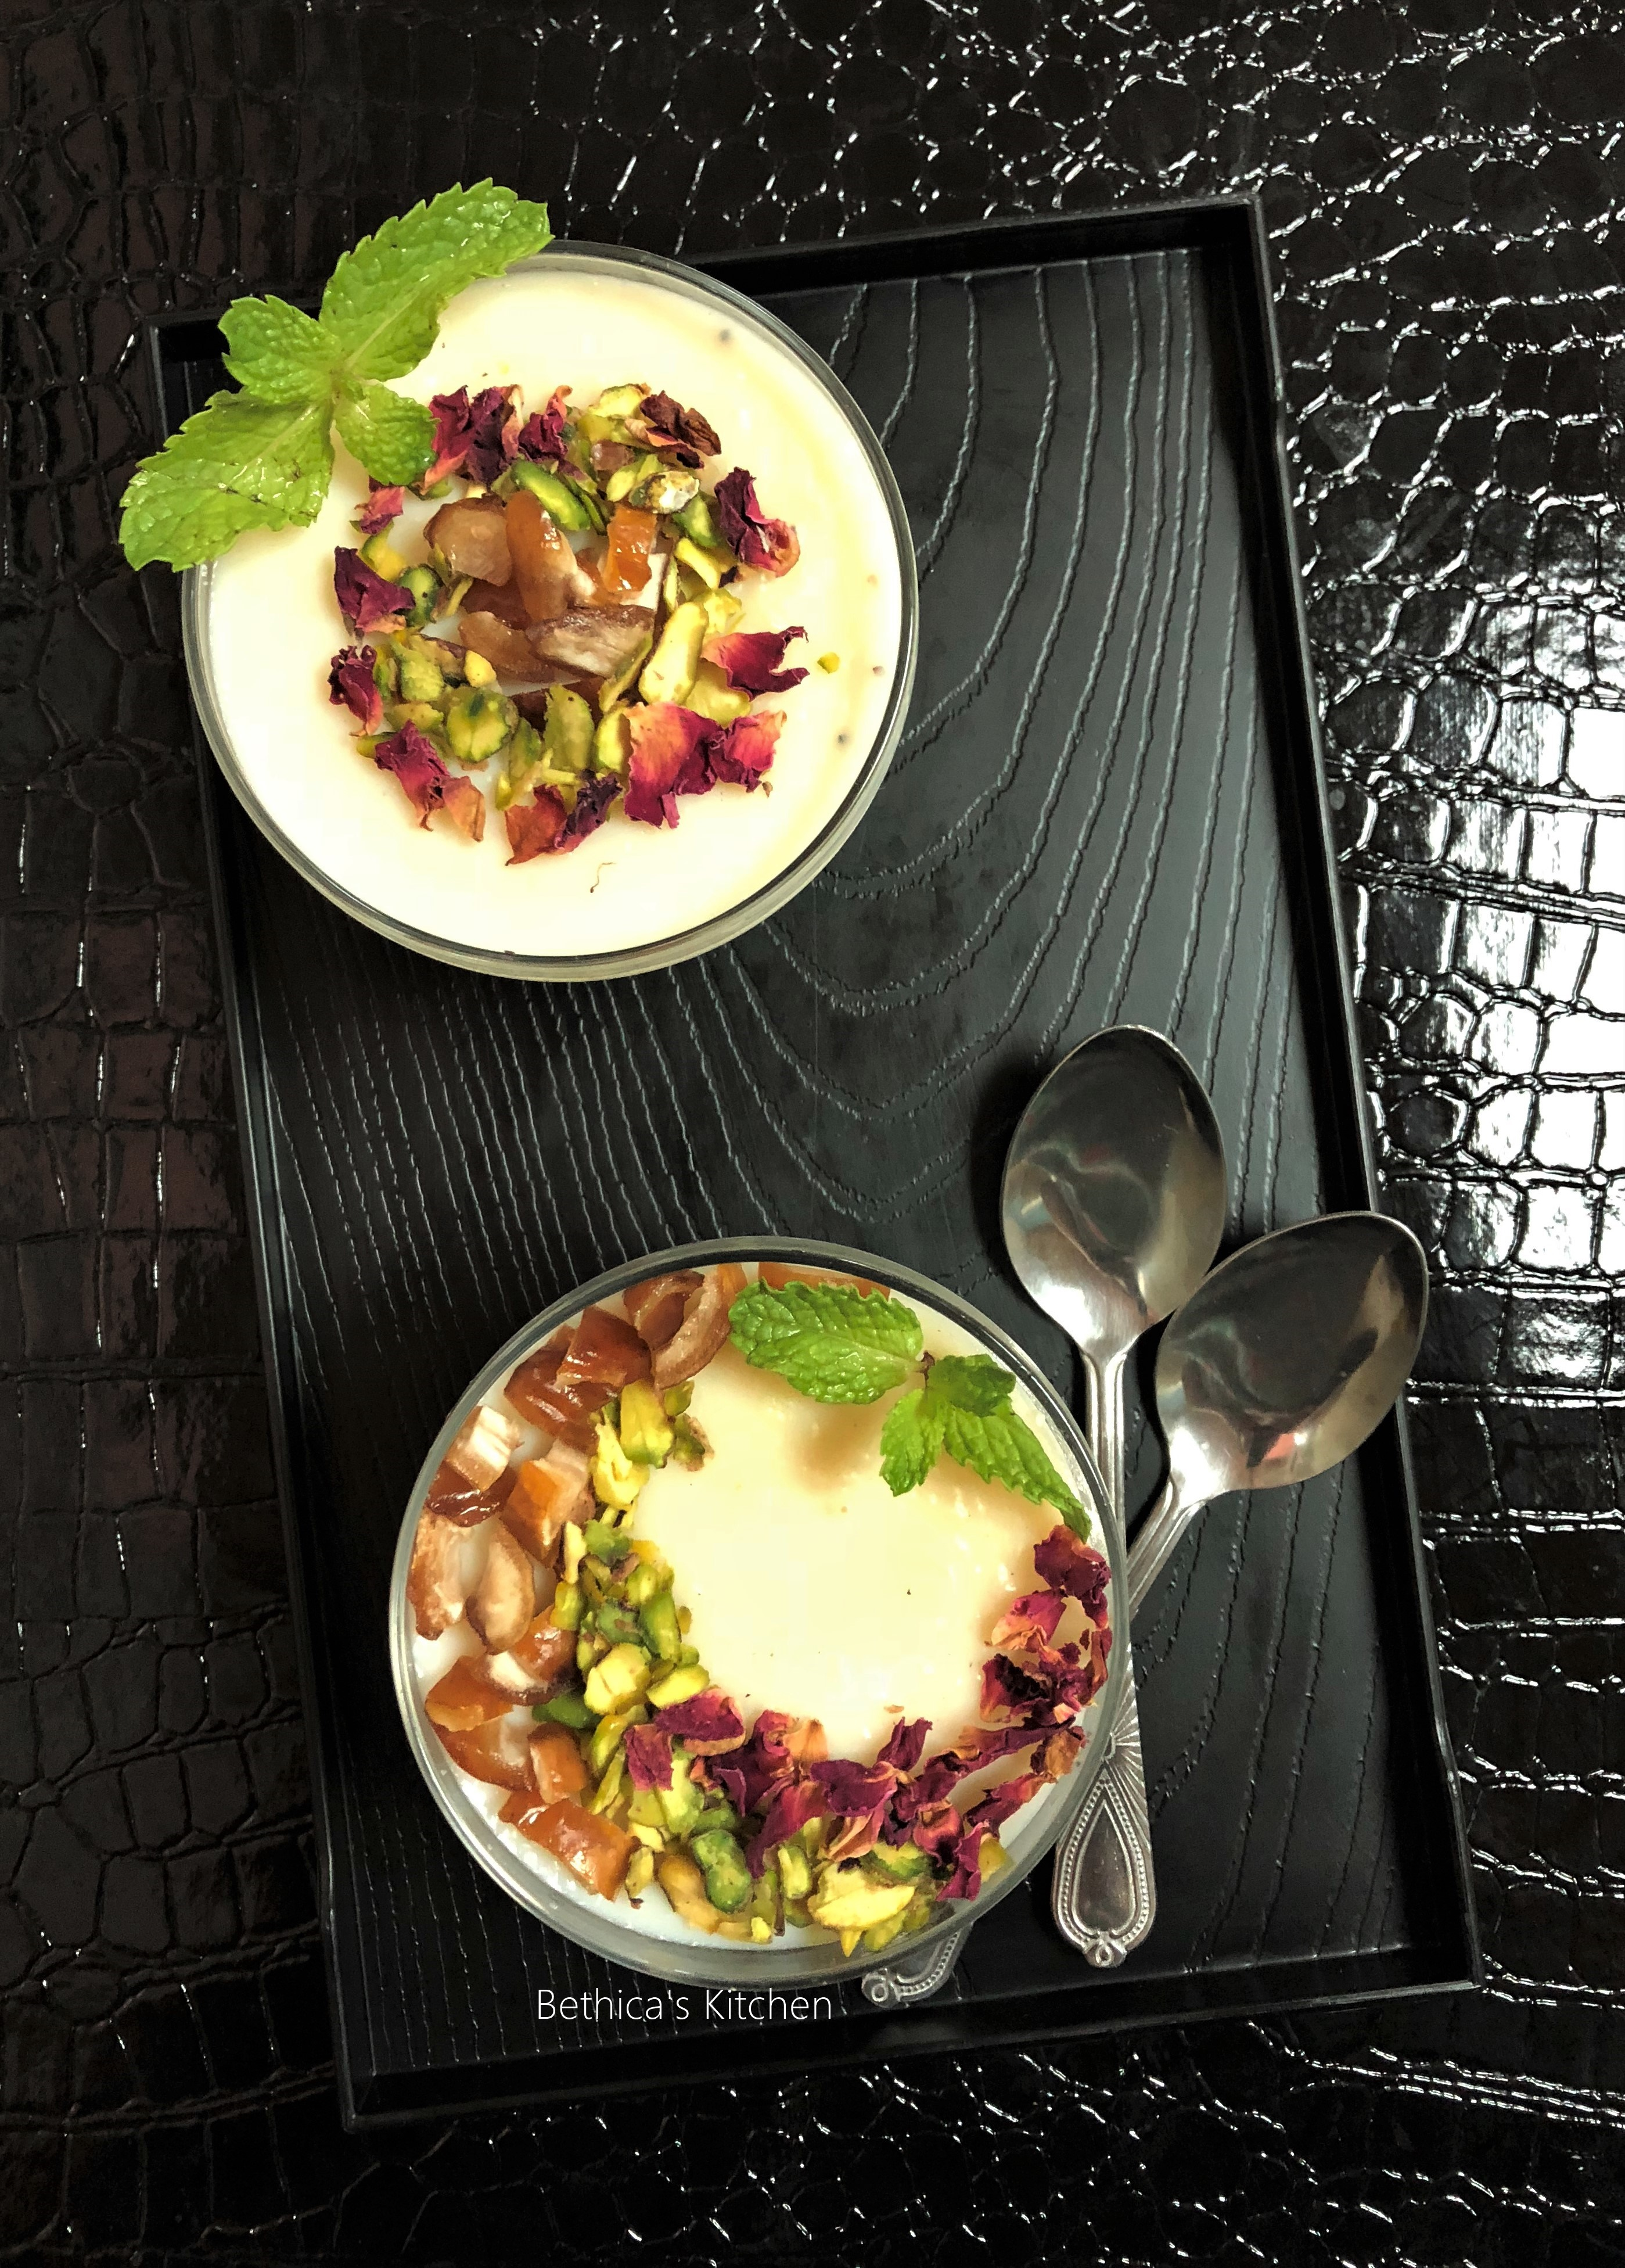 Mahalabia (Middle Eastern Ramadan / Festive Dessert)